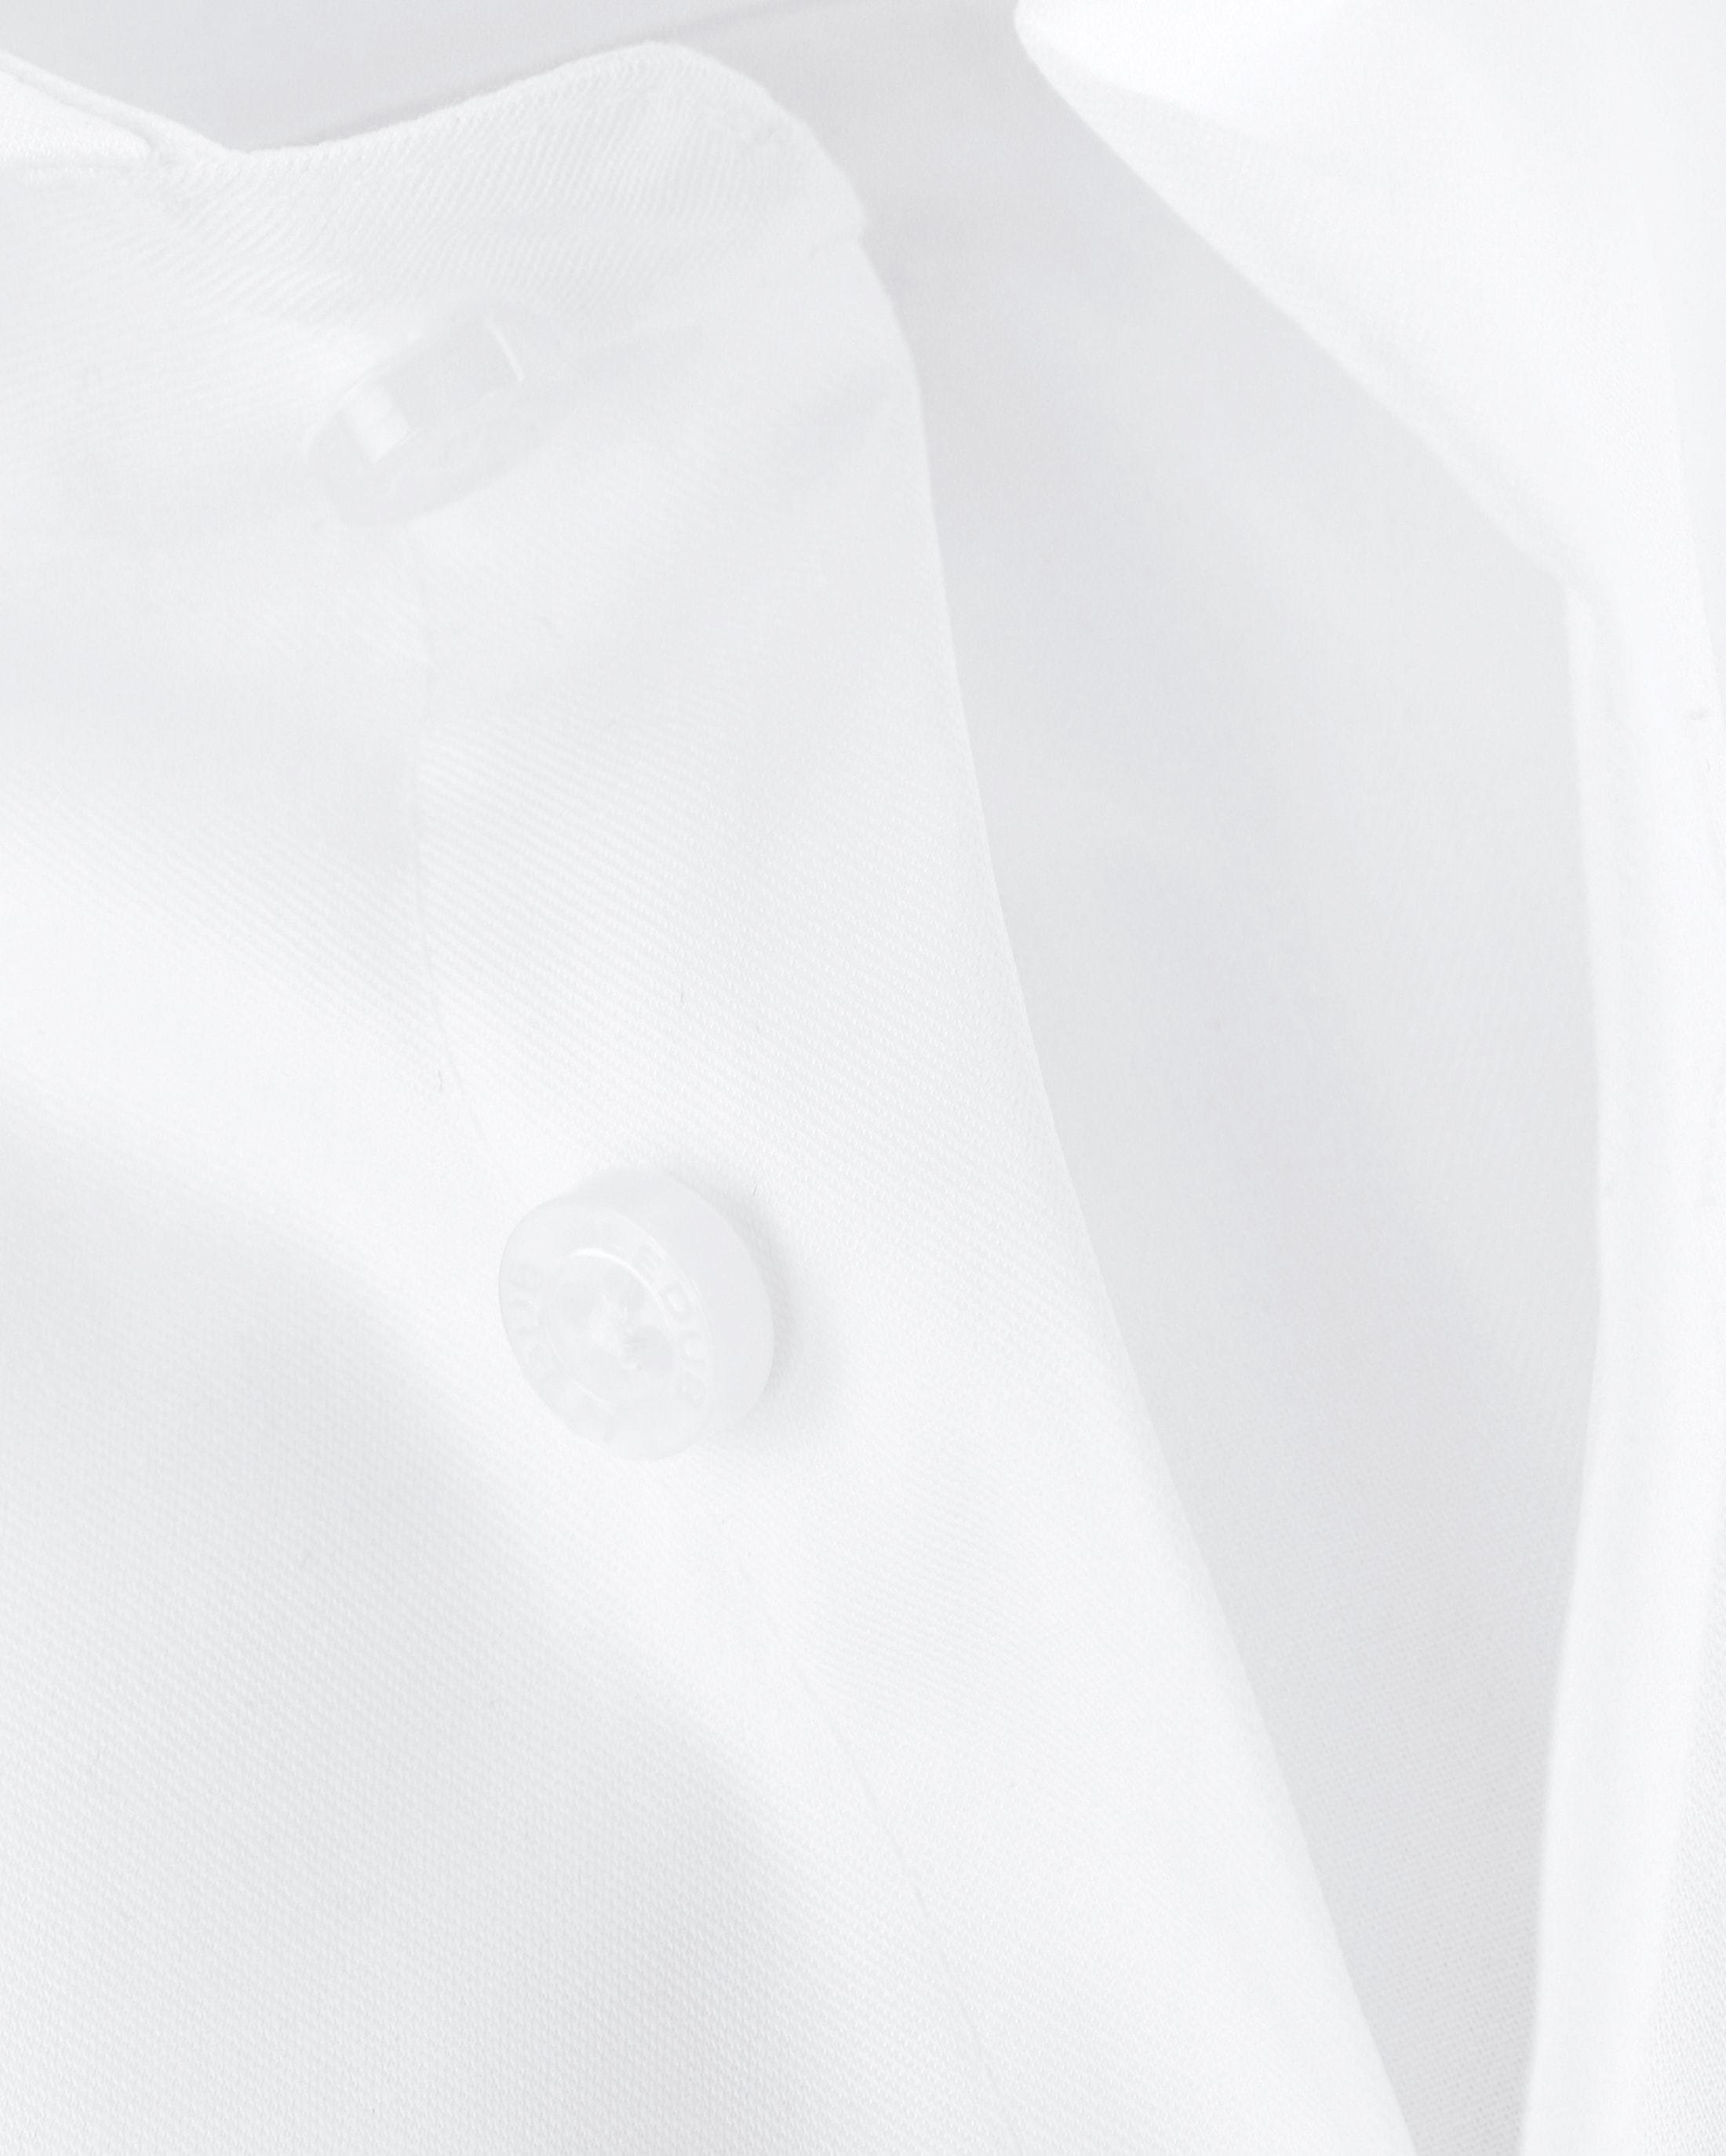 Ledub SL7 Hemd Bügelfrei Weiß foto 1